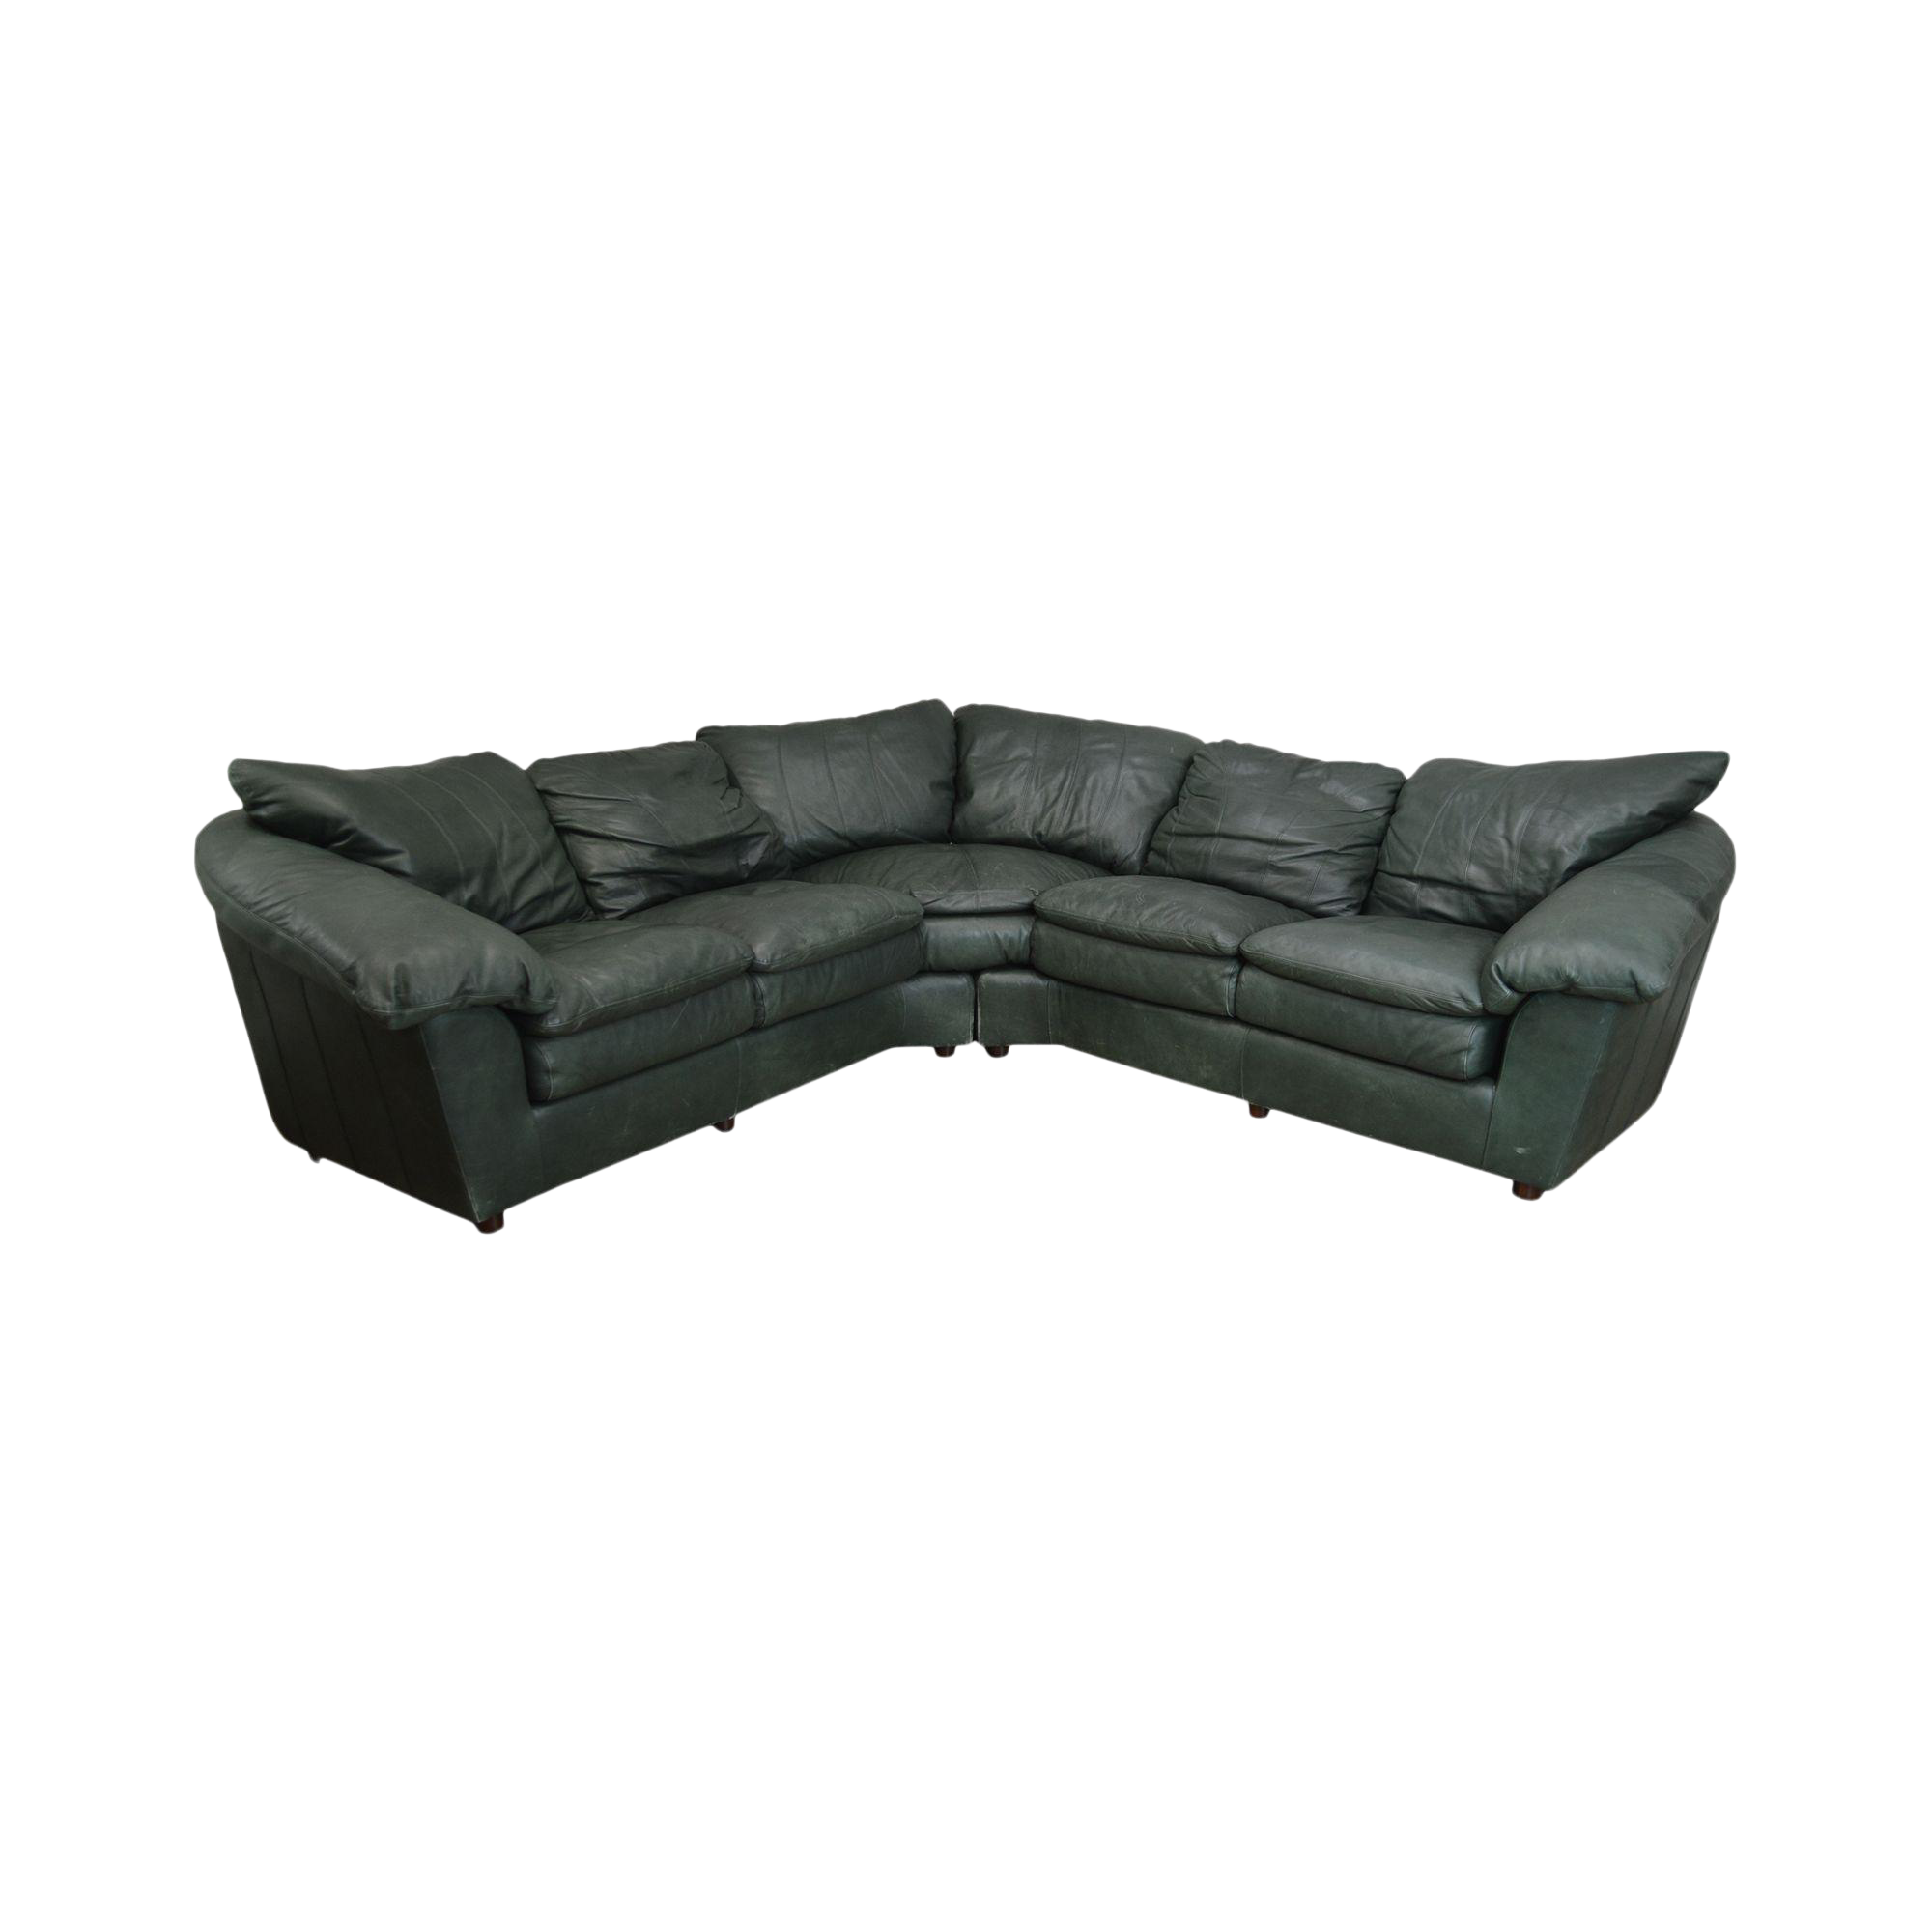 - Hancock & Moore Green Leather Sectional Sofa Chairish